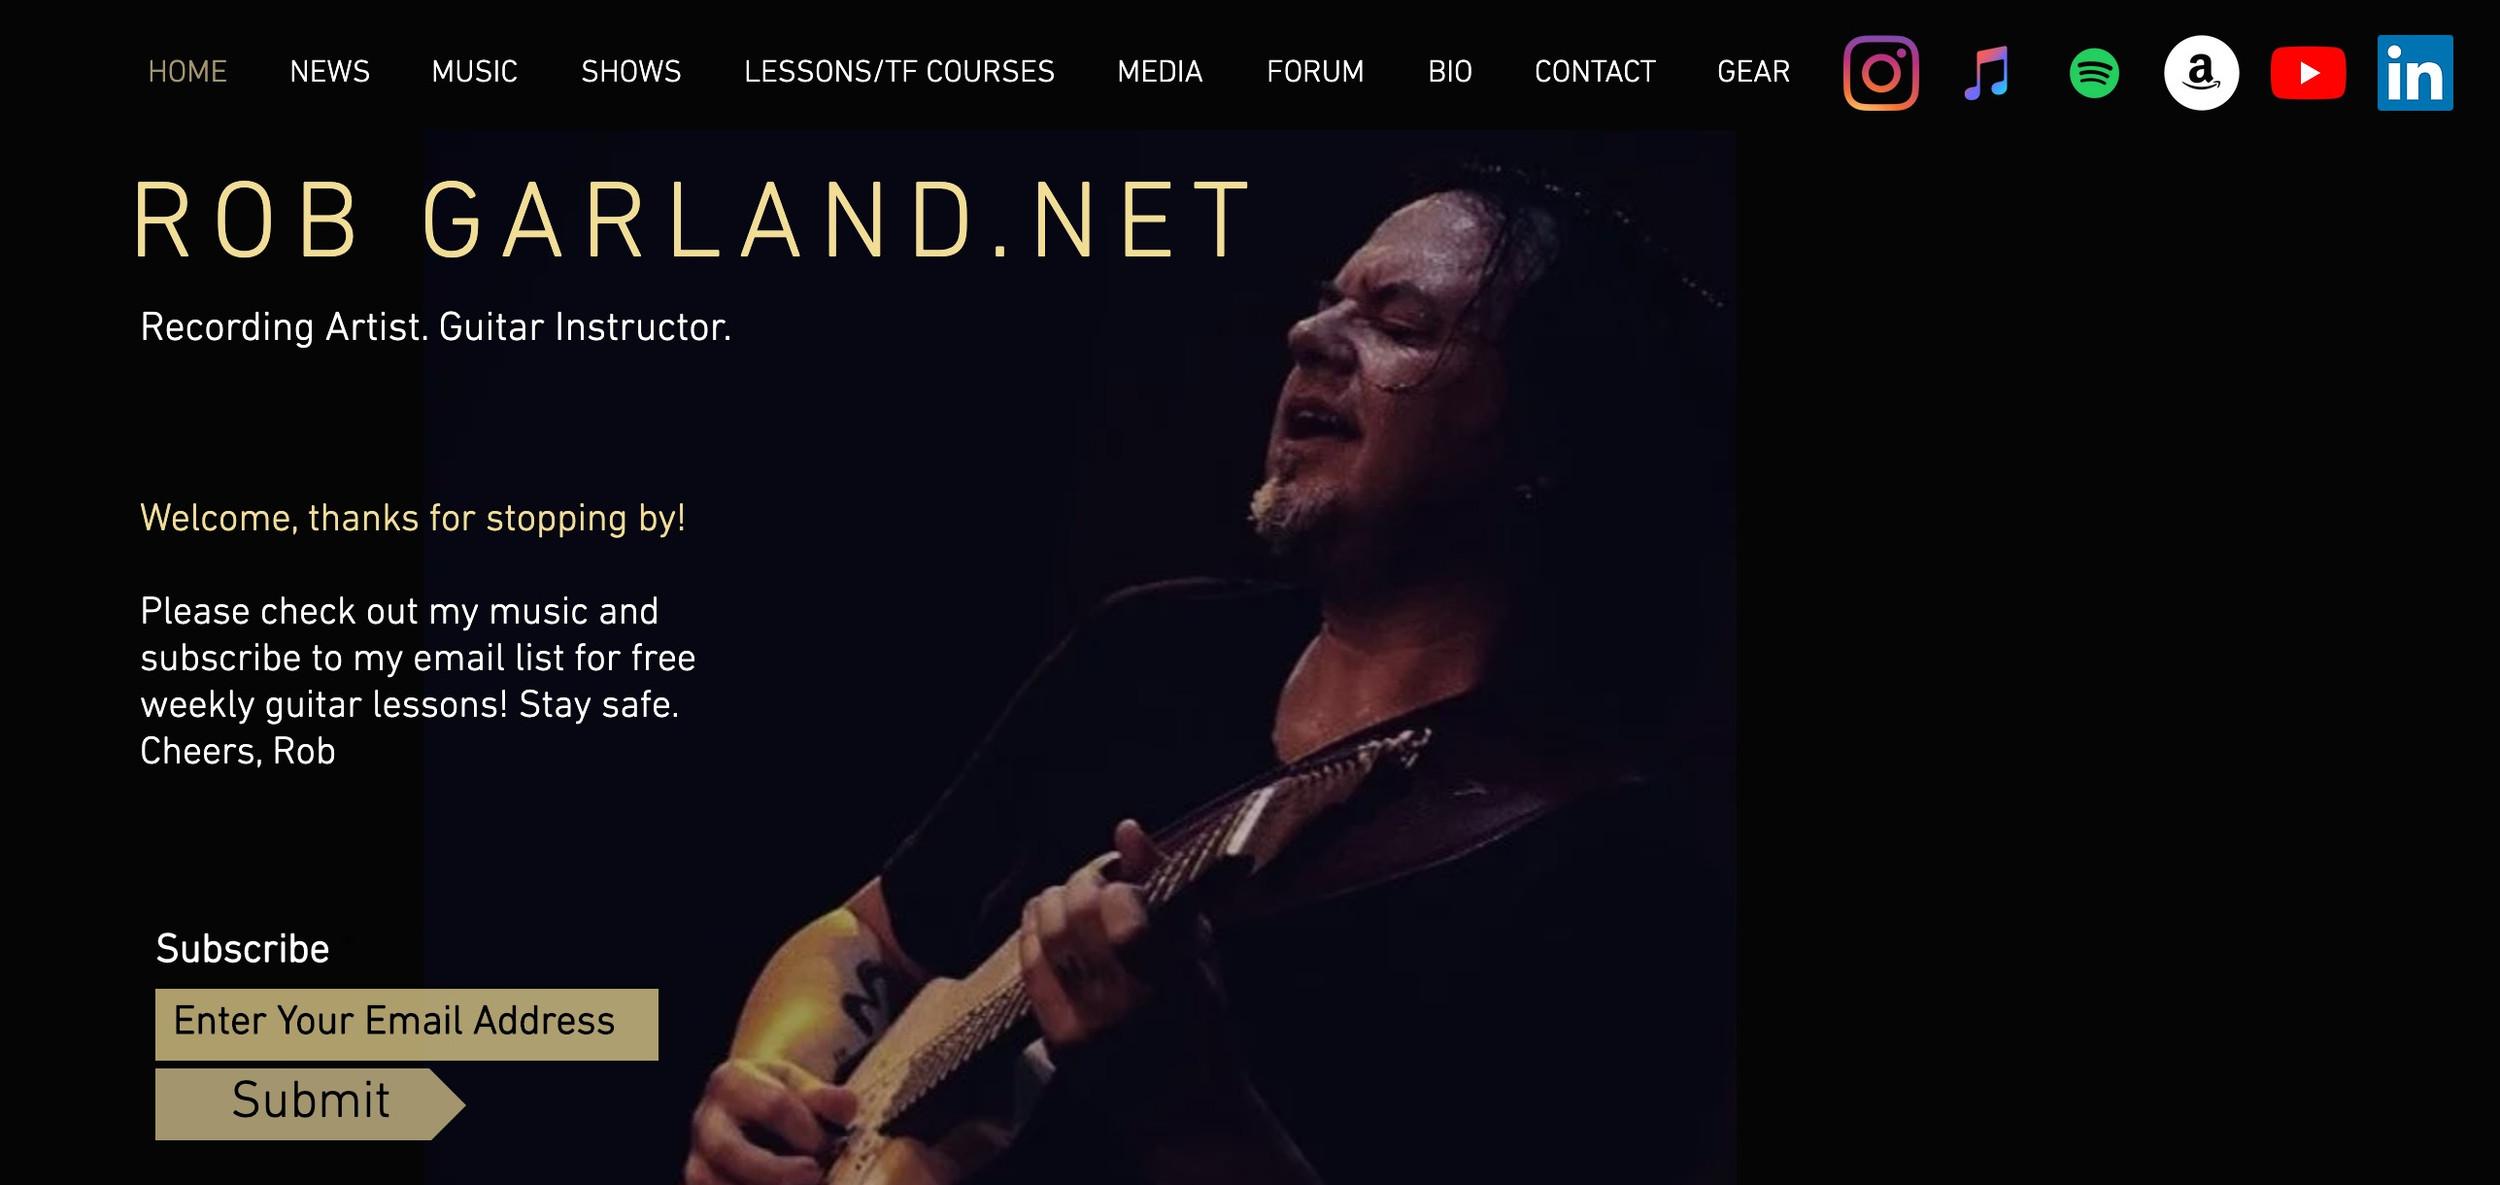 www.robgarland.net